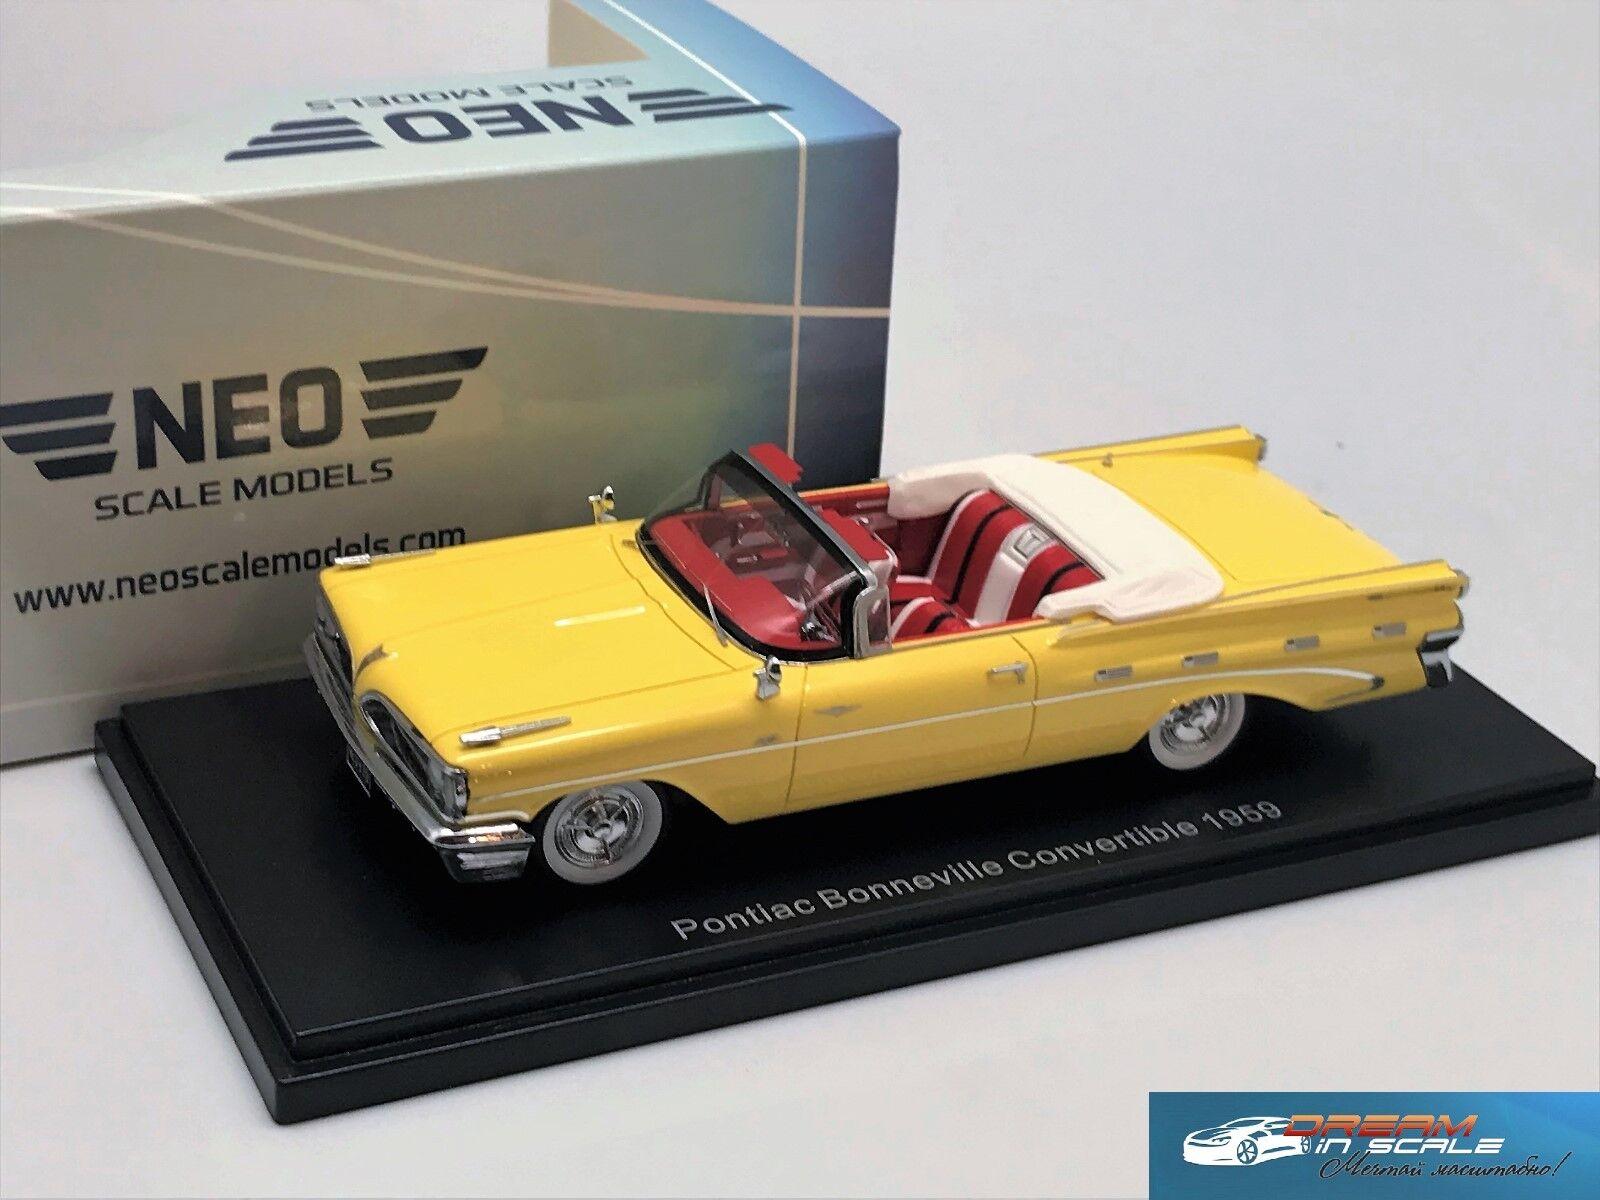 Pontiac Bonneville Congreenible 1959 Yellow White NEO 46030 1 43